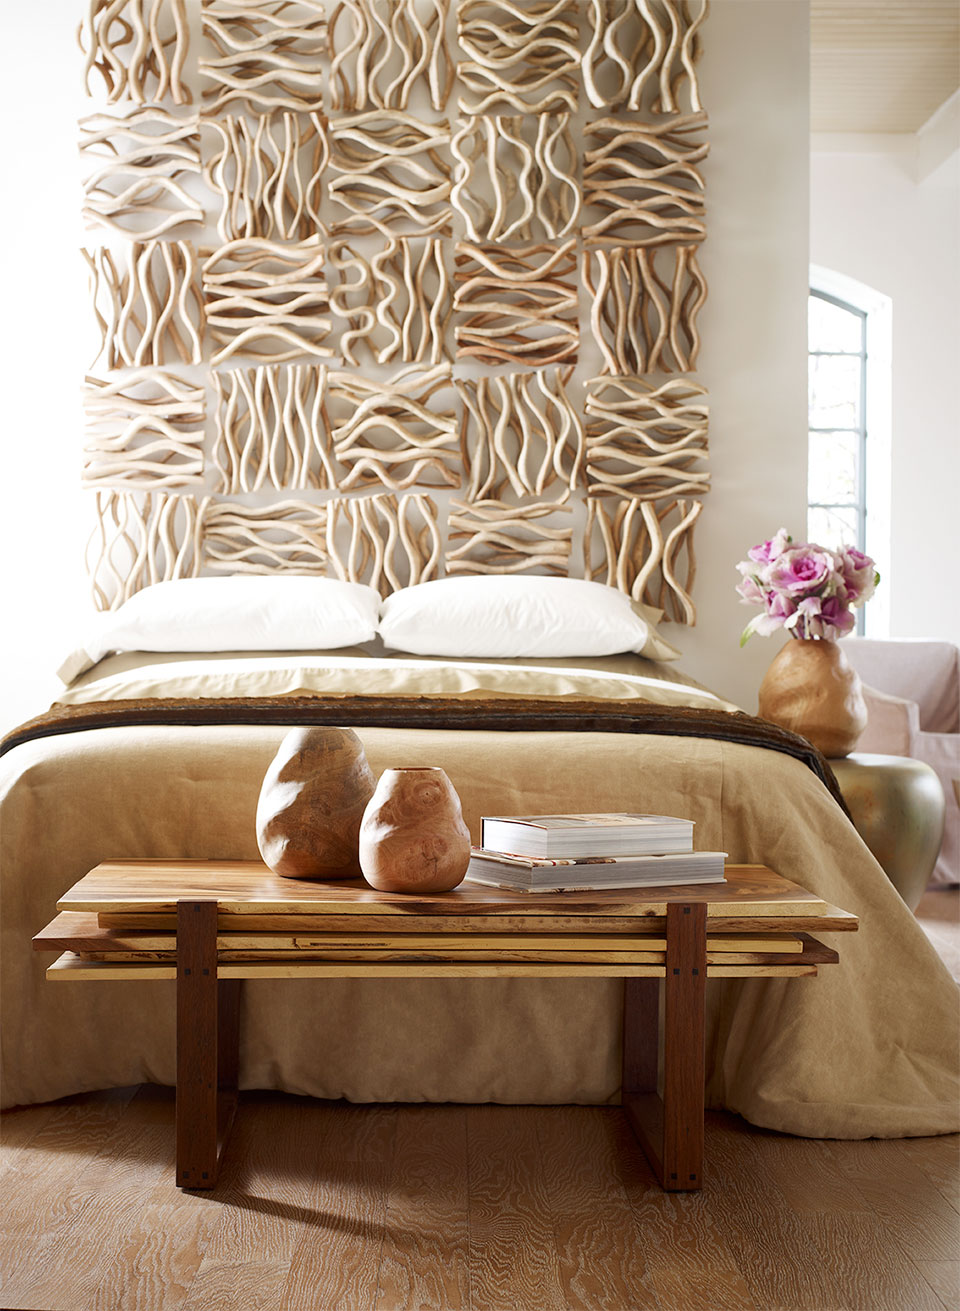 vine-wall-tiles